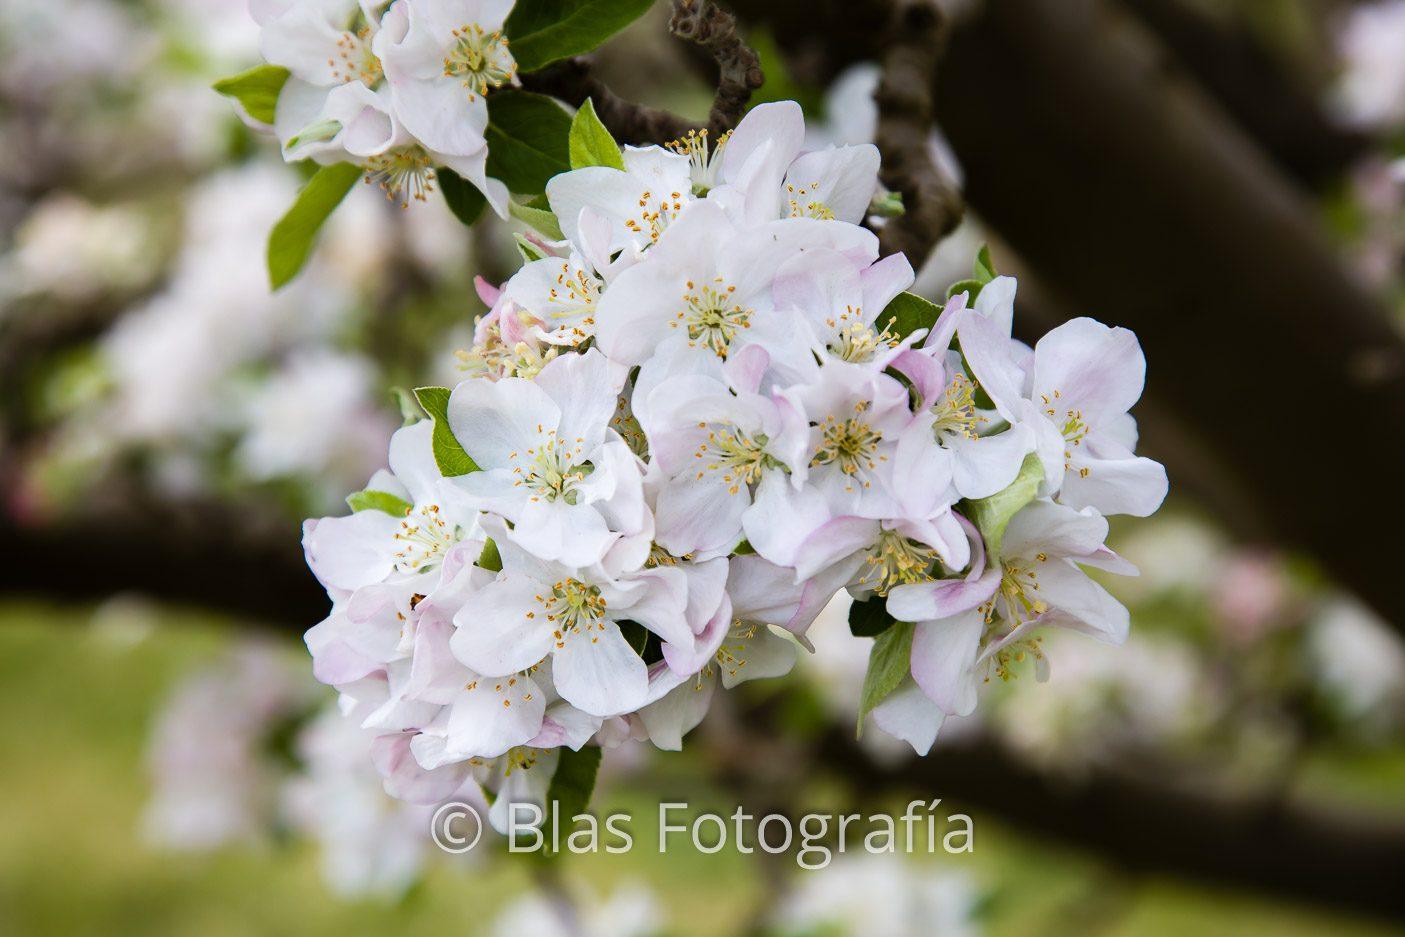 Flores de Malus domestica